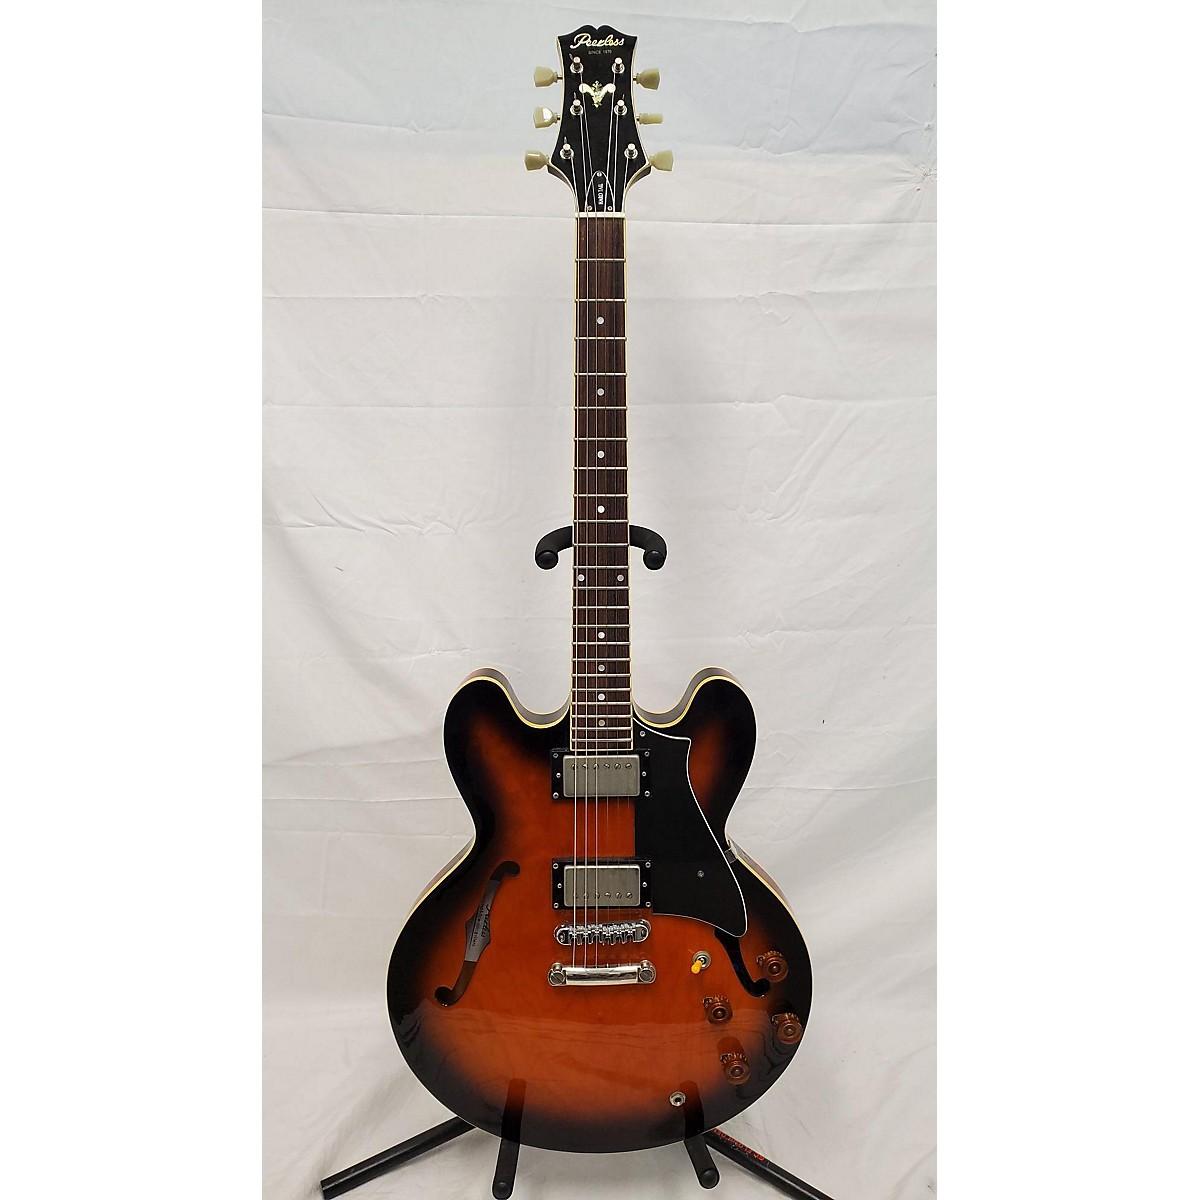 PEERLESS HARDTAIL Hollow Body Electric Guitar